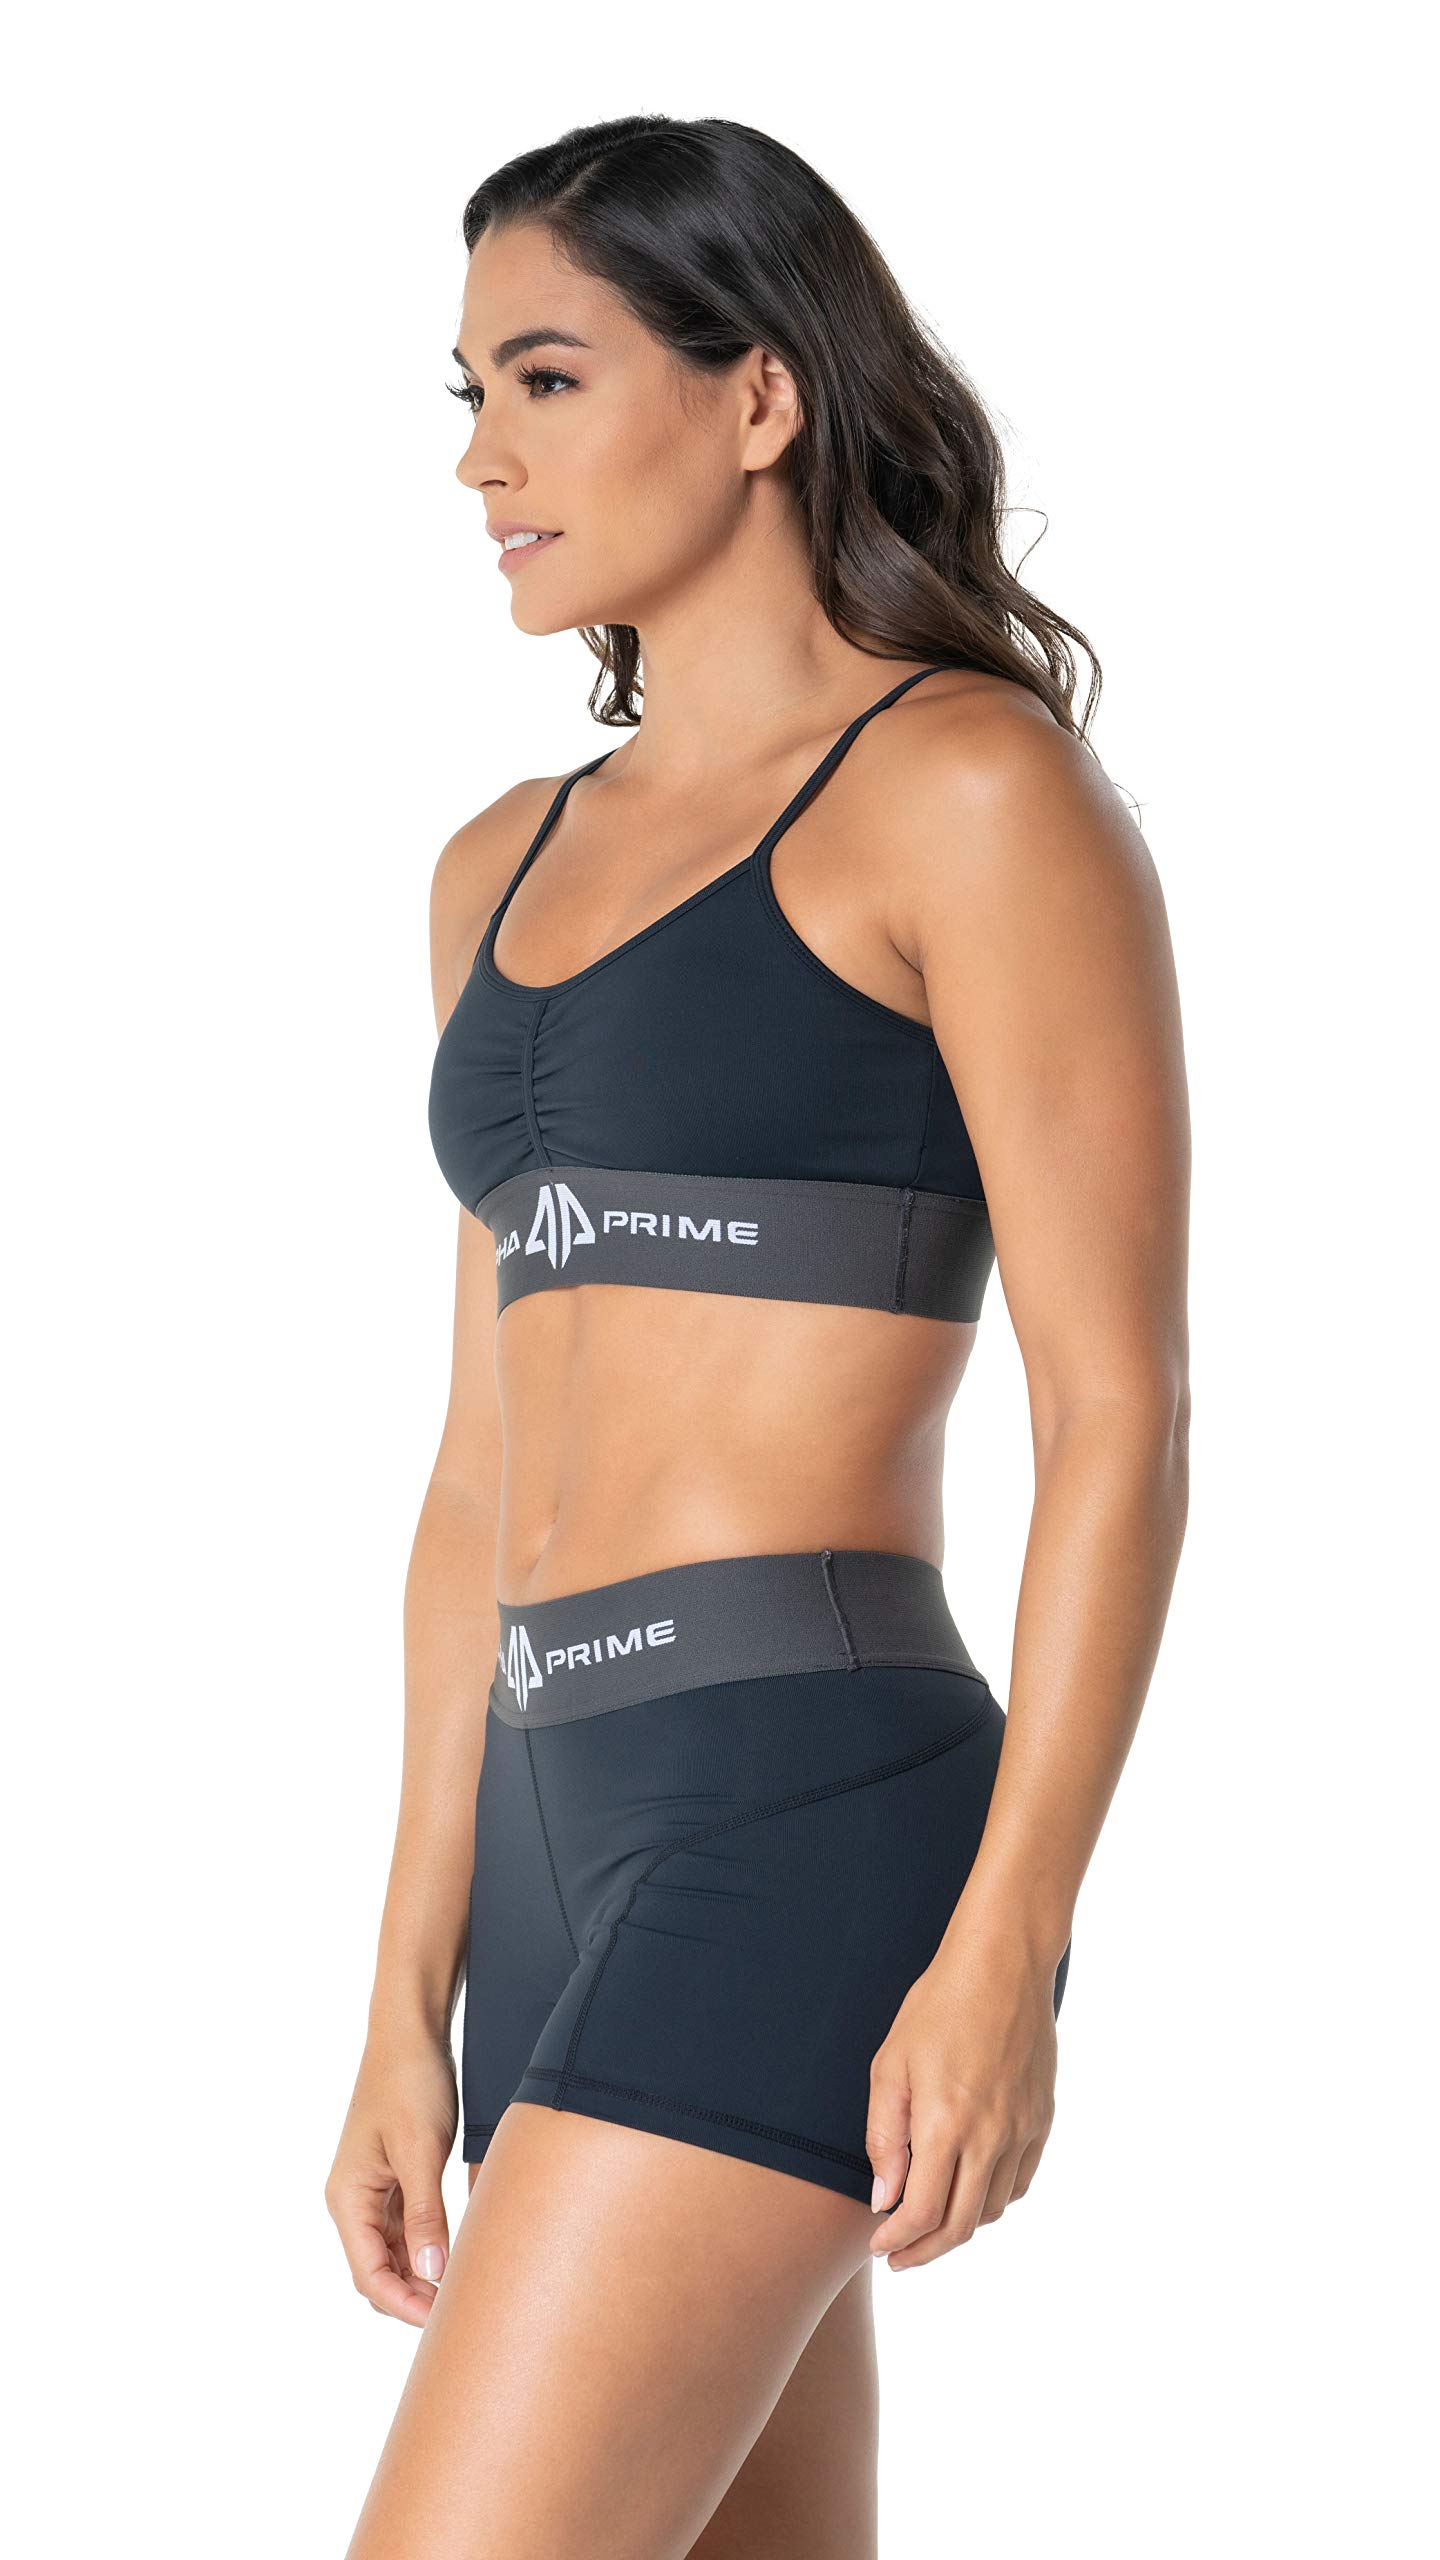 Alpha Prime Womens Lux Sports Bra